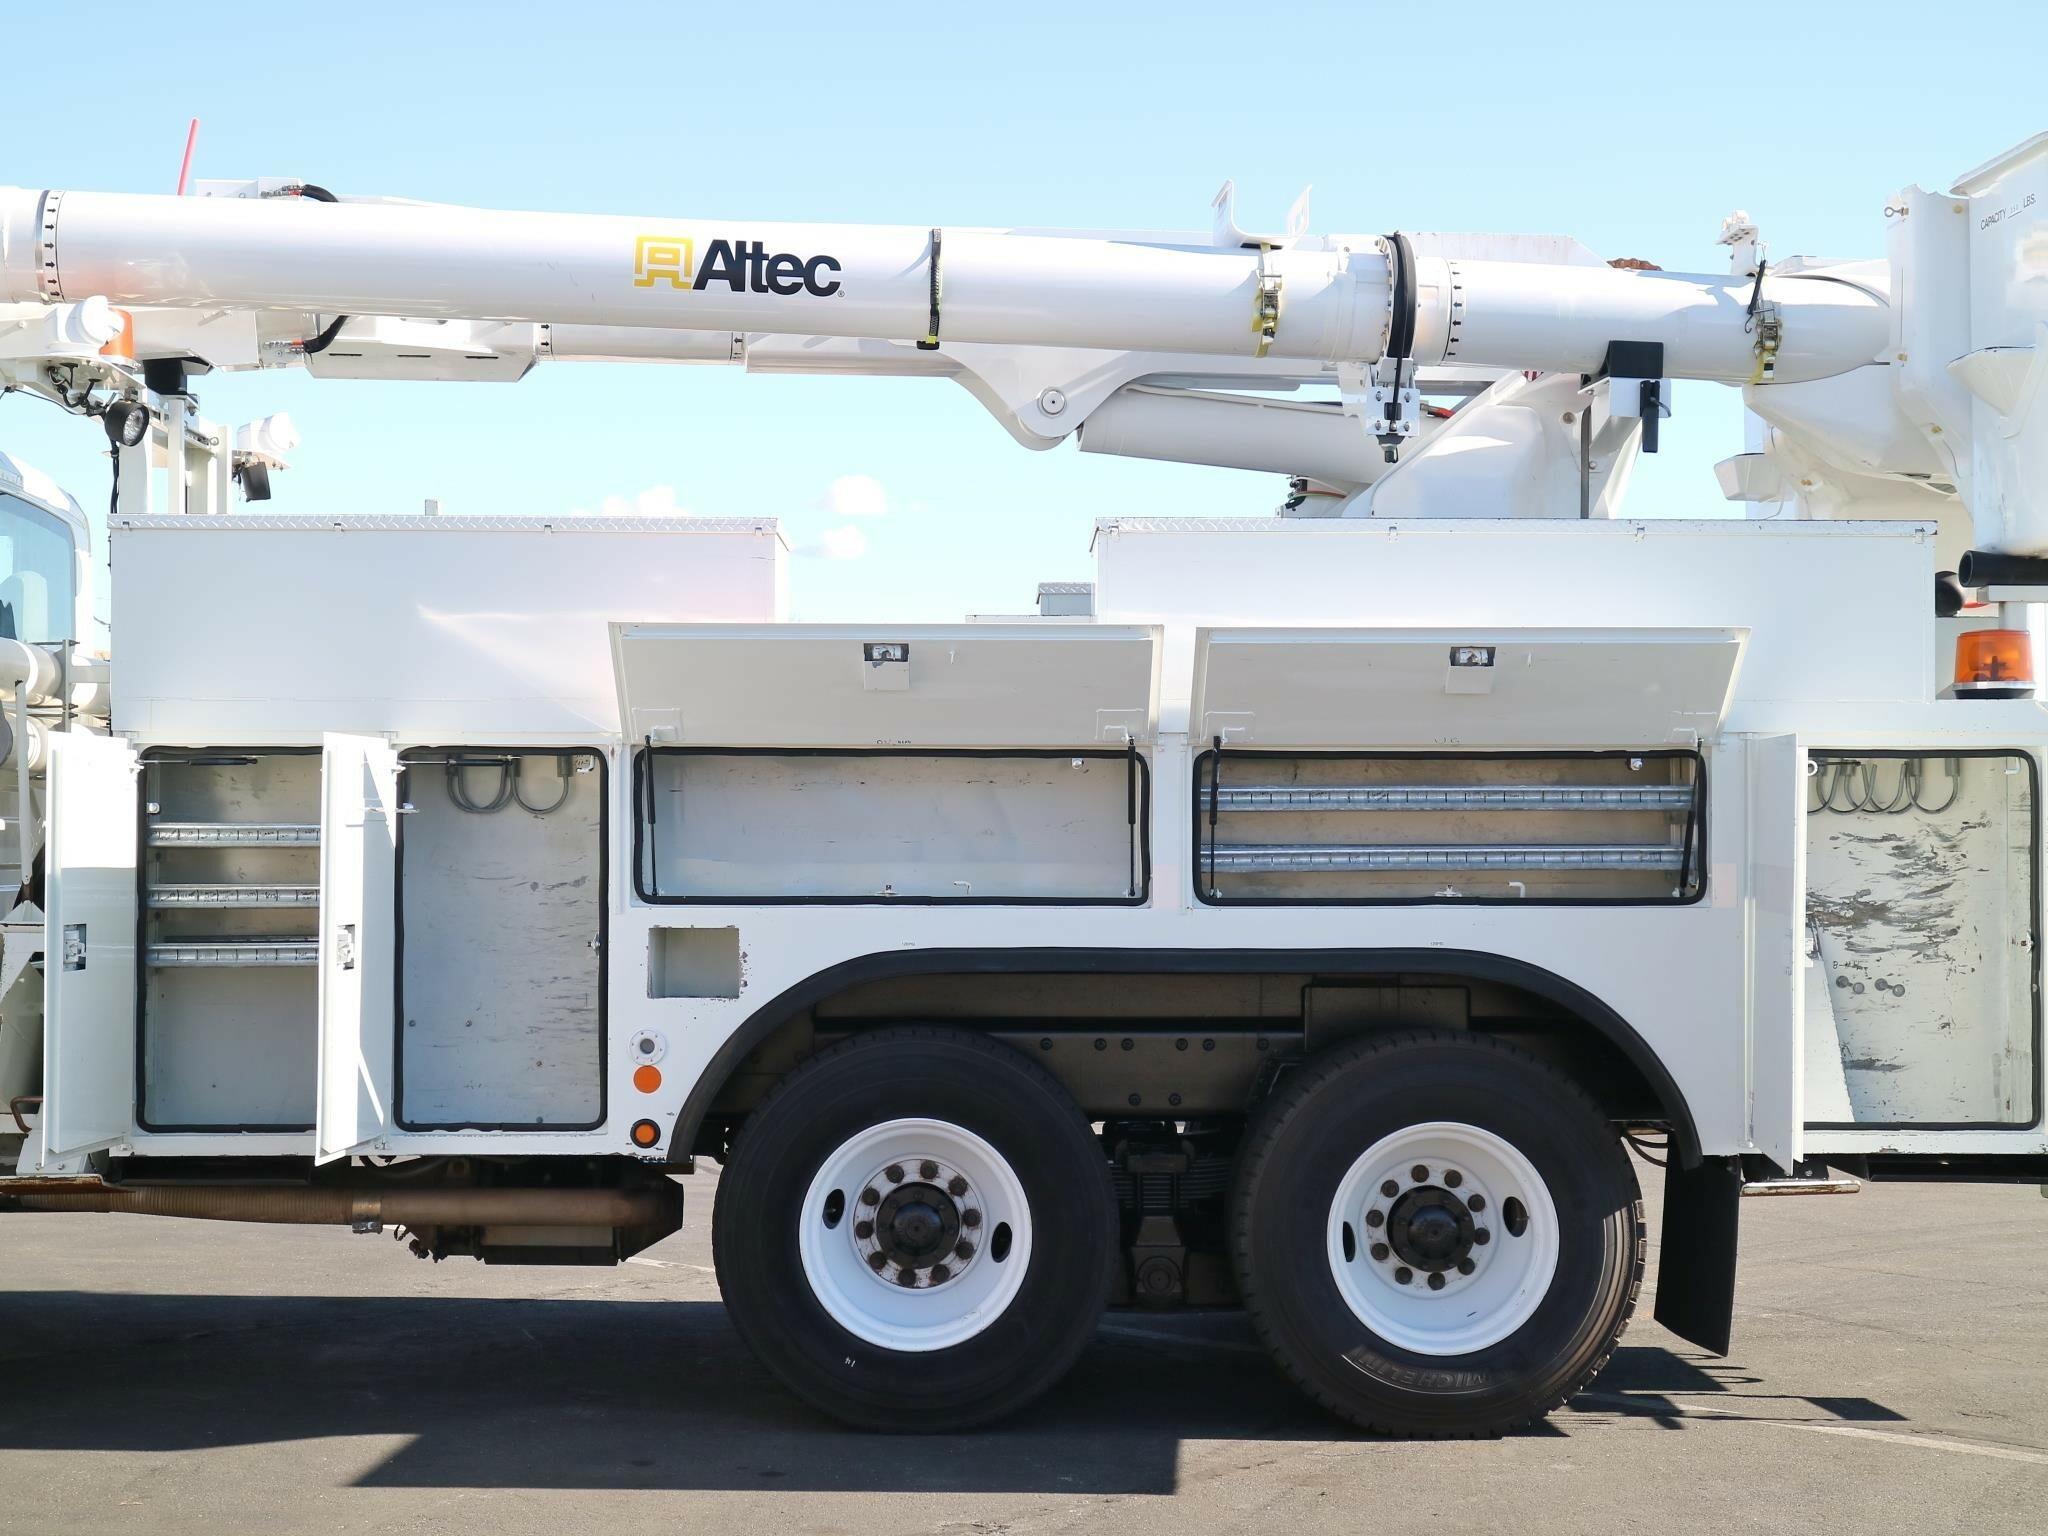 View 2006 ALTEC AM55 - Listing #1551642